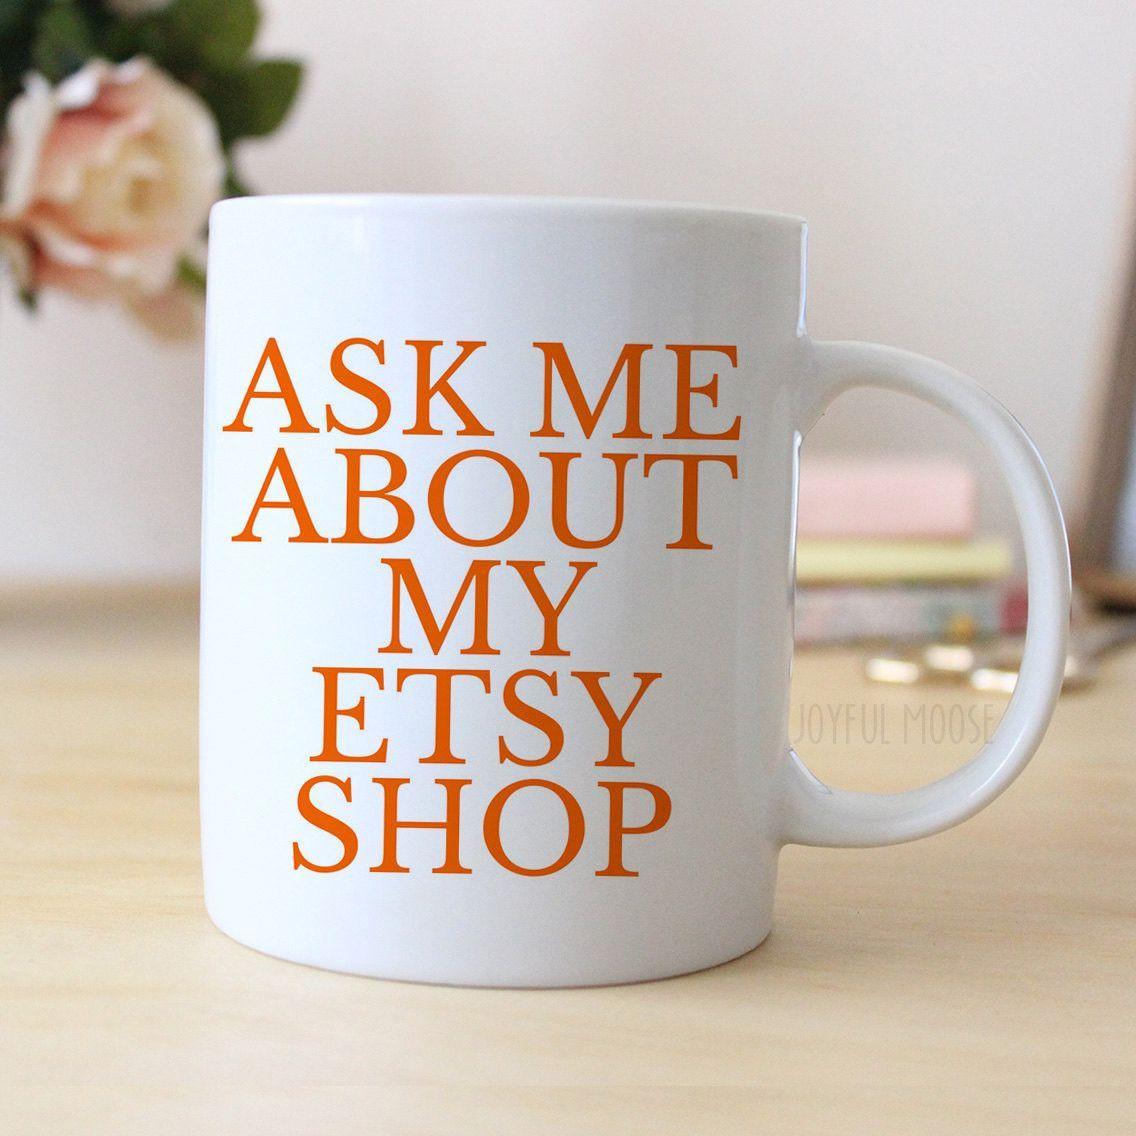 Etsy Coffee Mug - Etsy Seller Gift | Etsy coffee, Mugs, Etsy